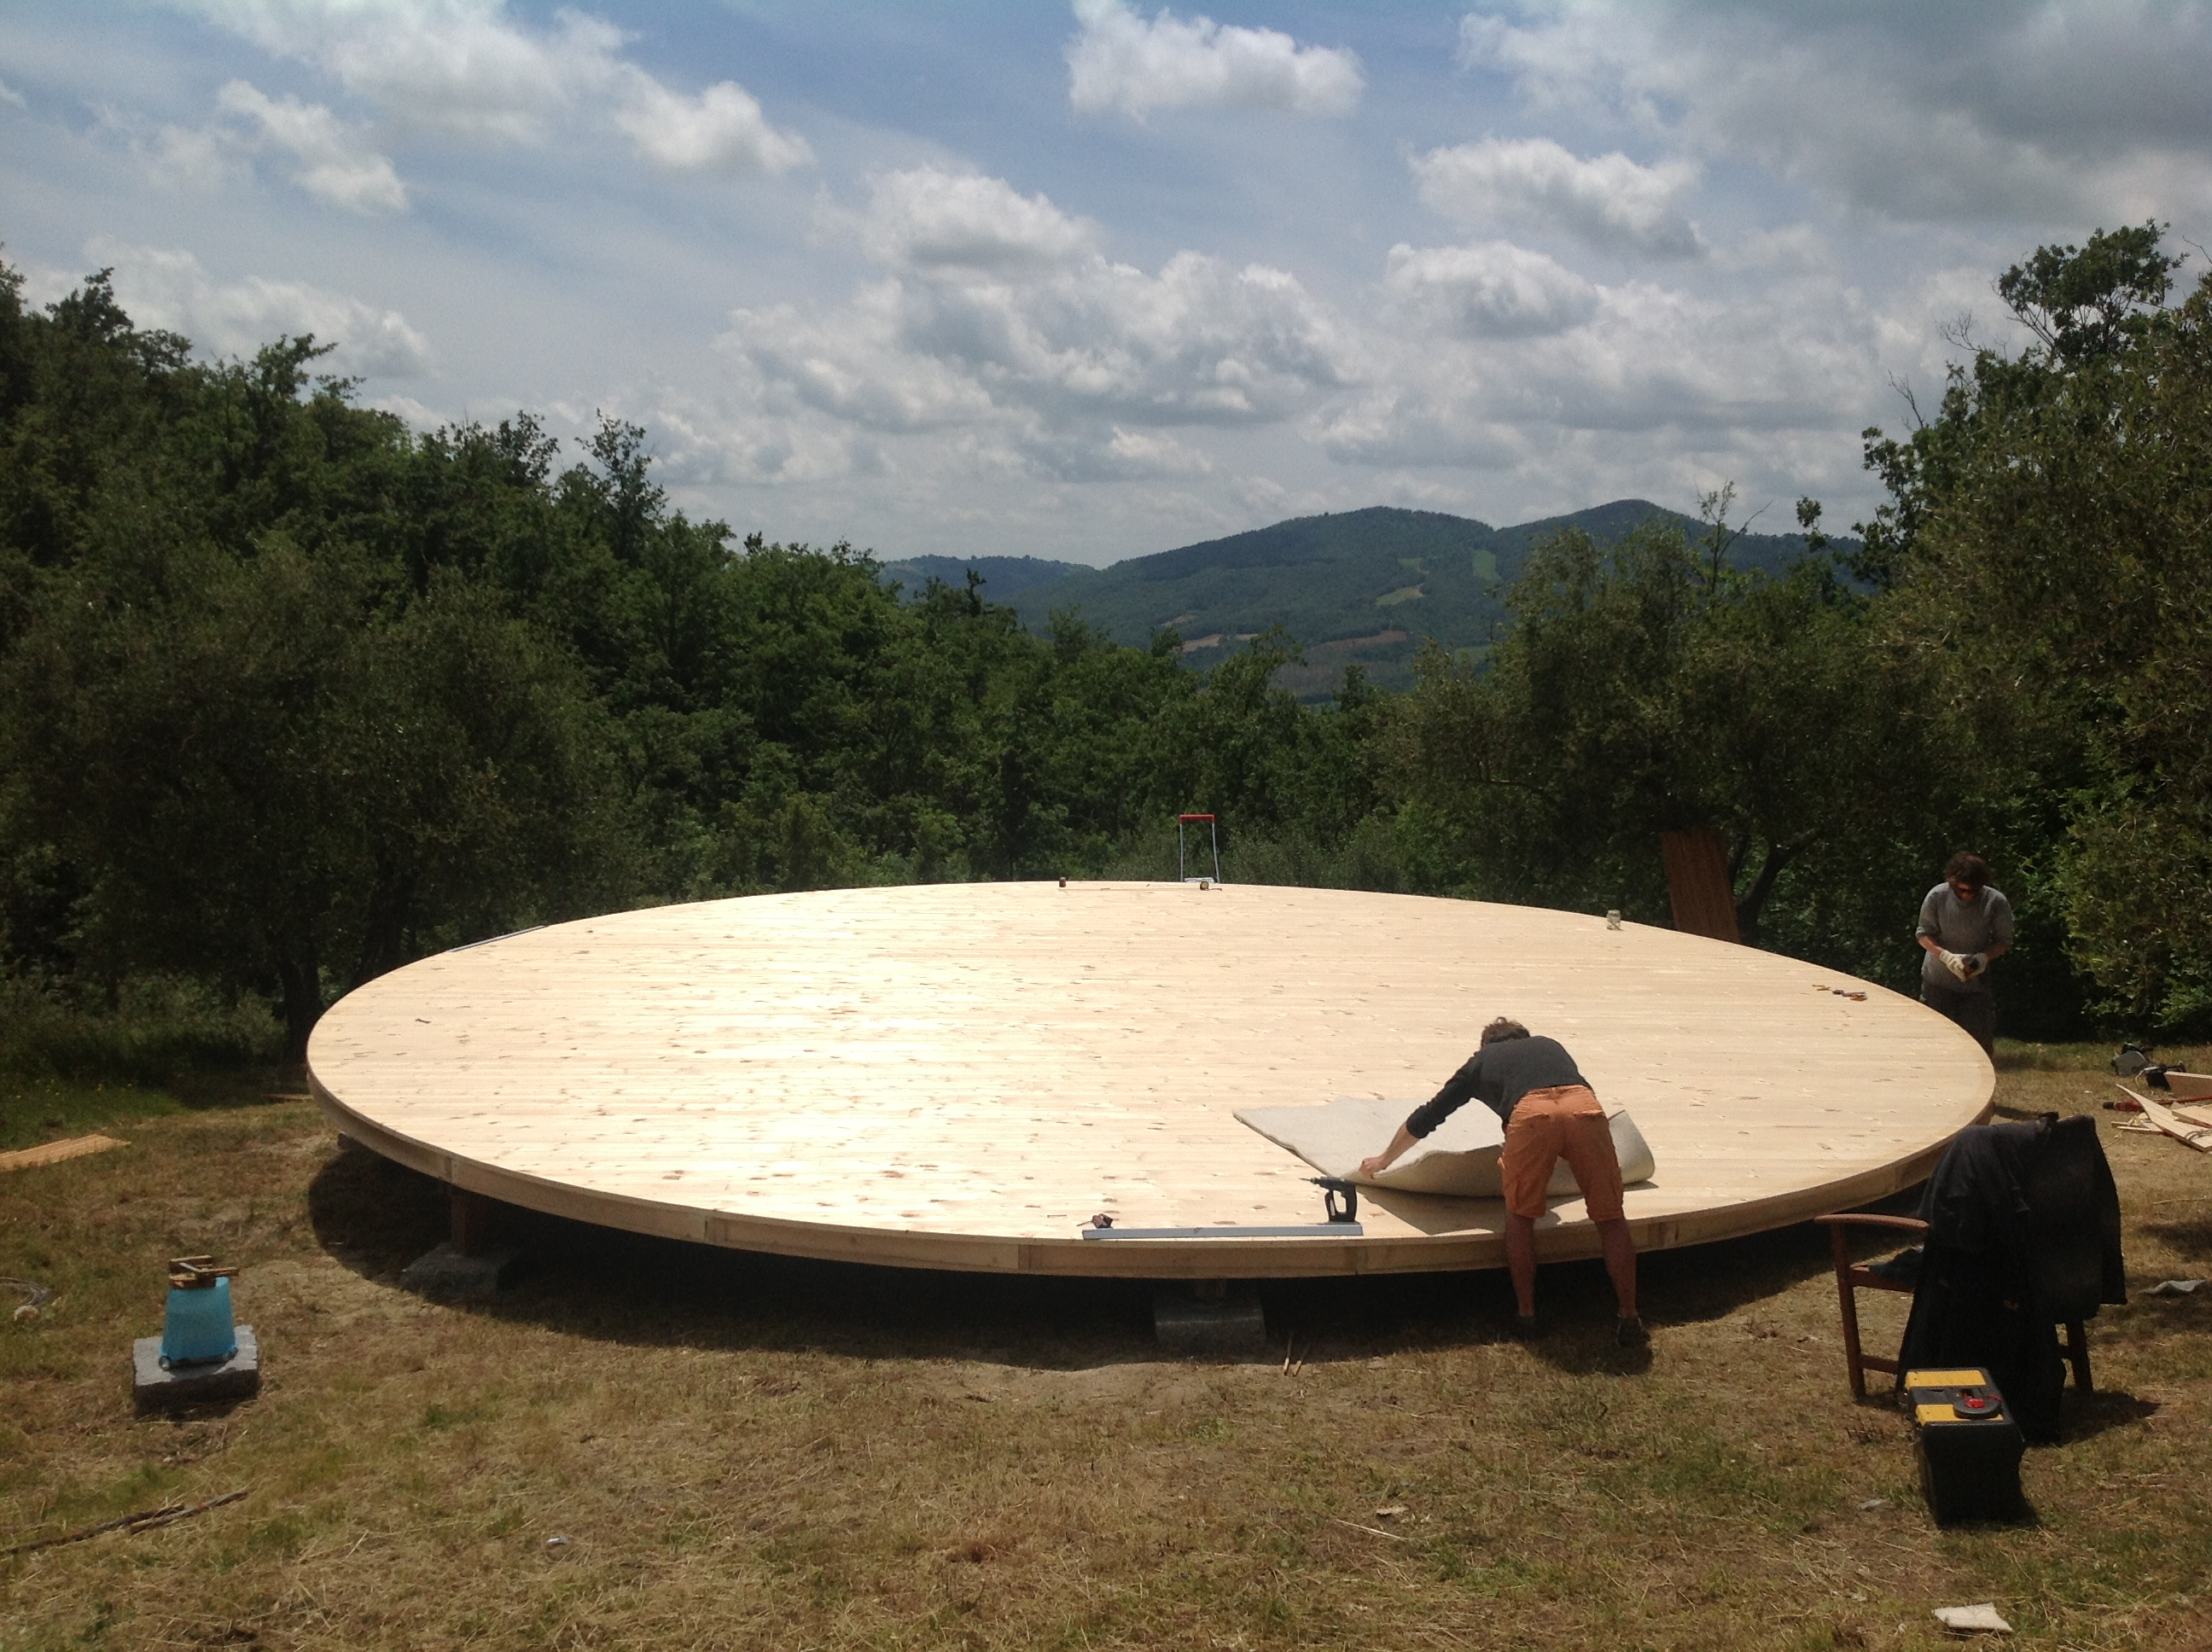 920cm platform in Italy